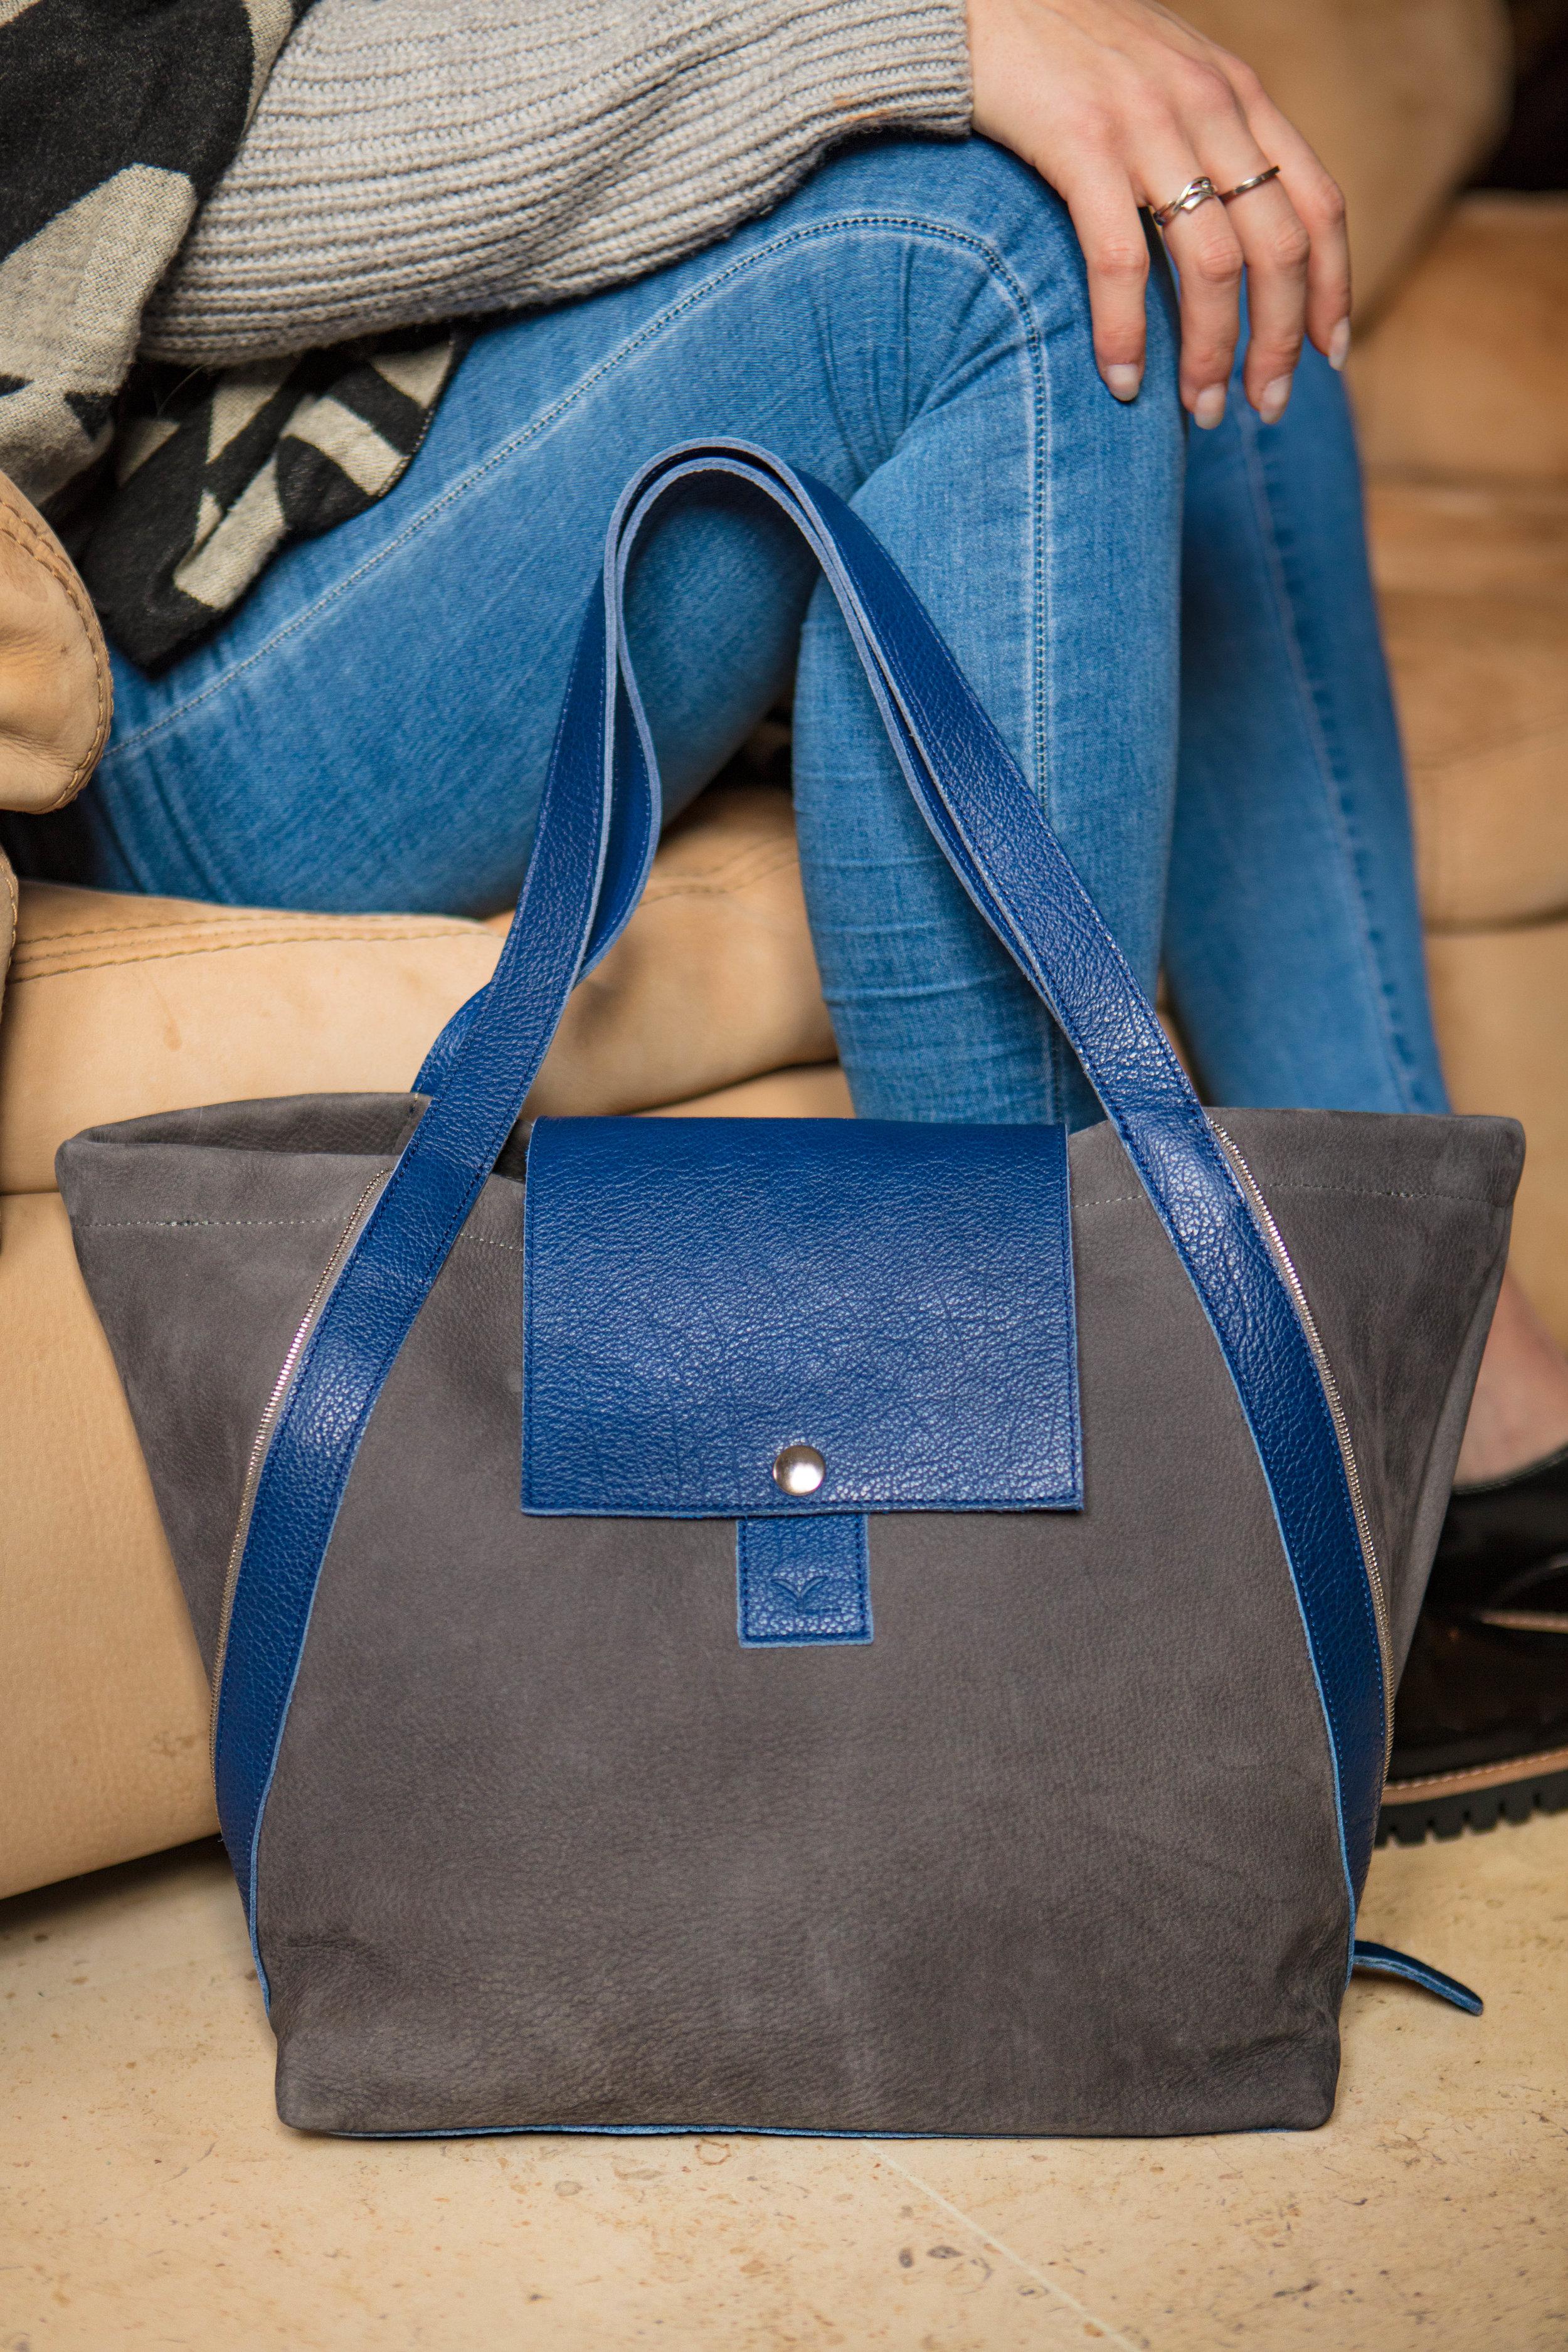 sac bleu.jpg